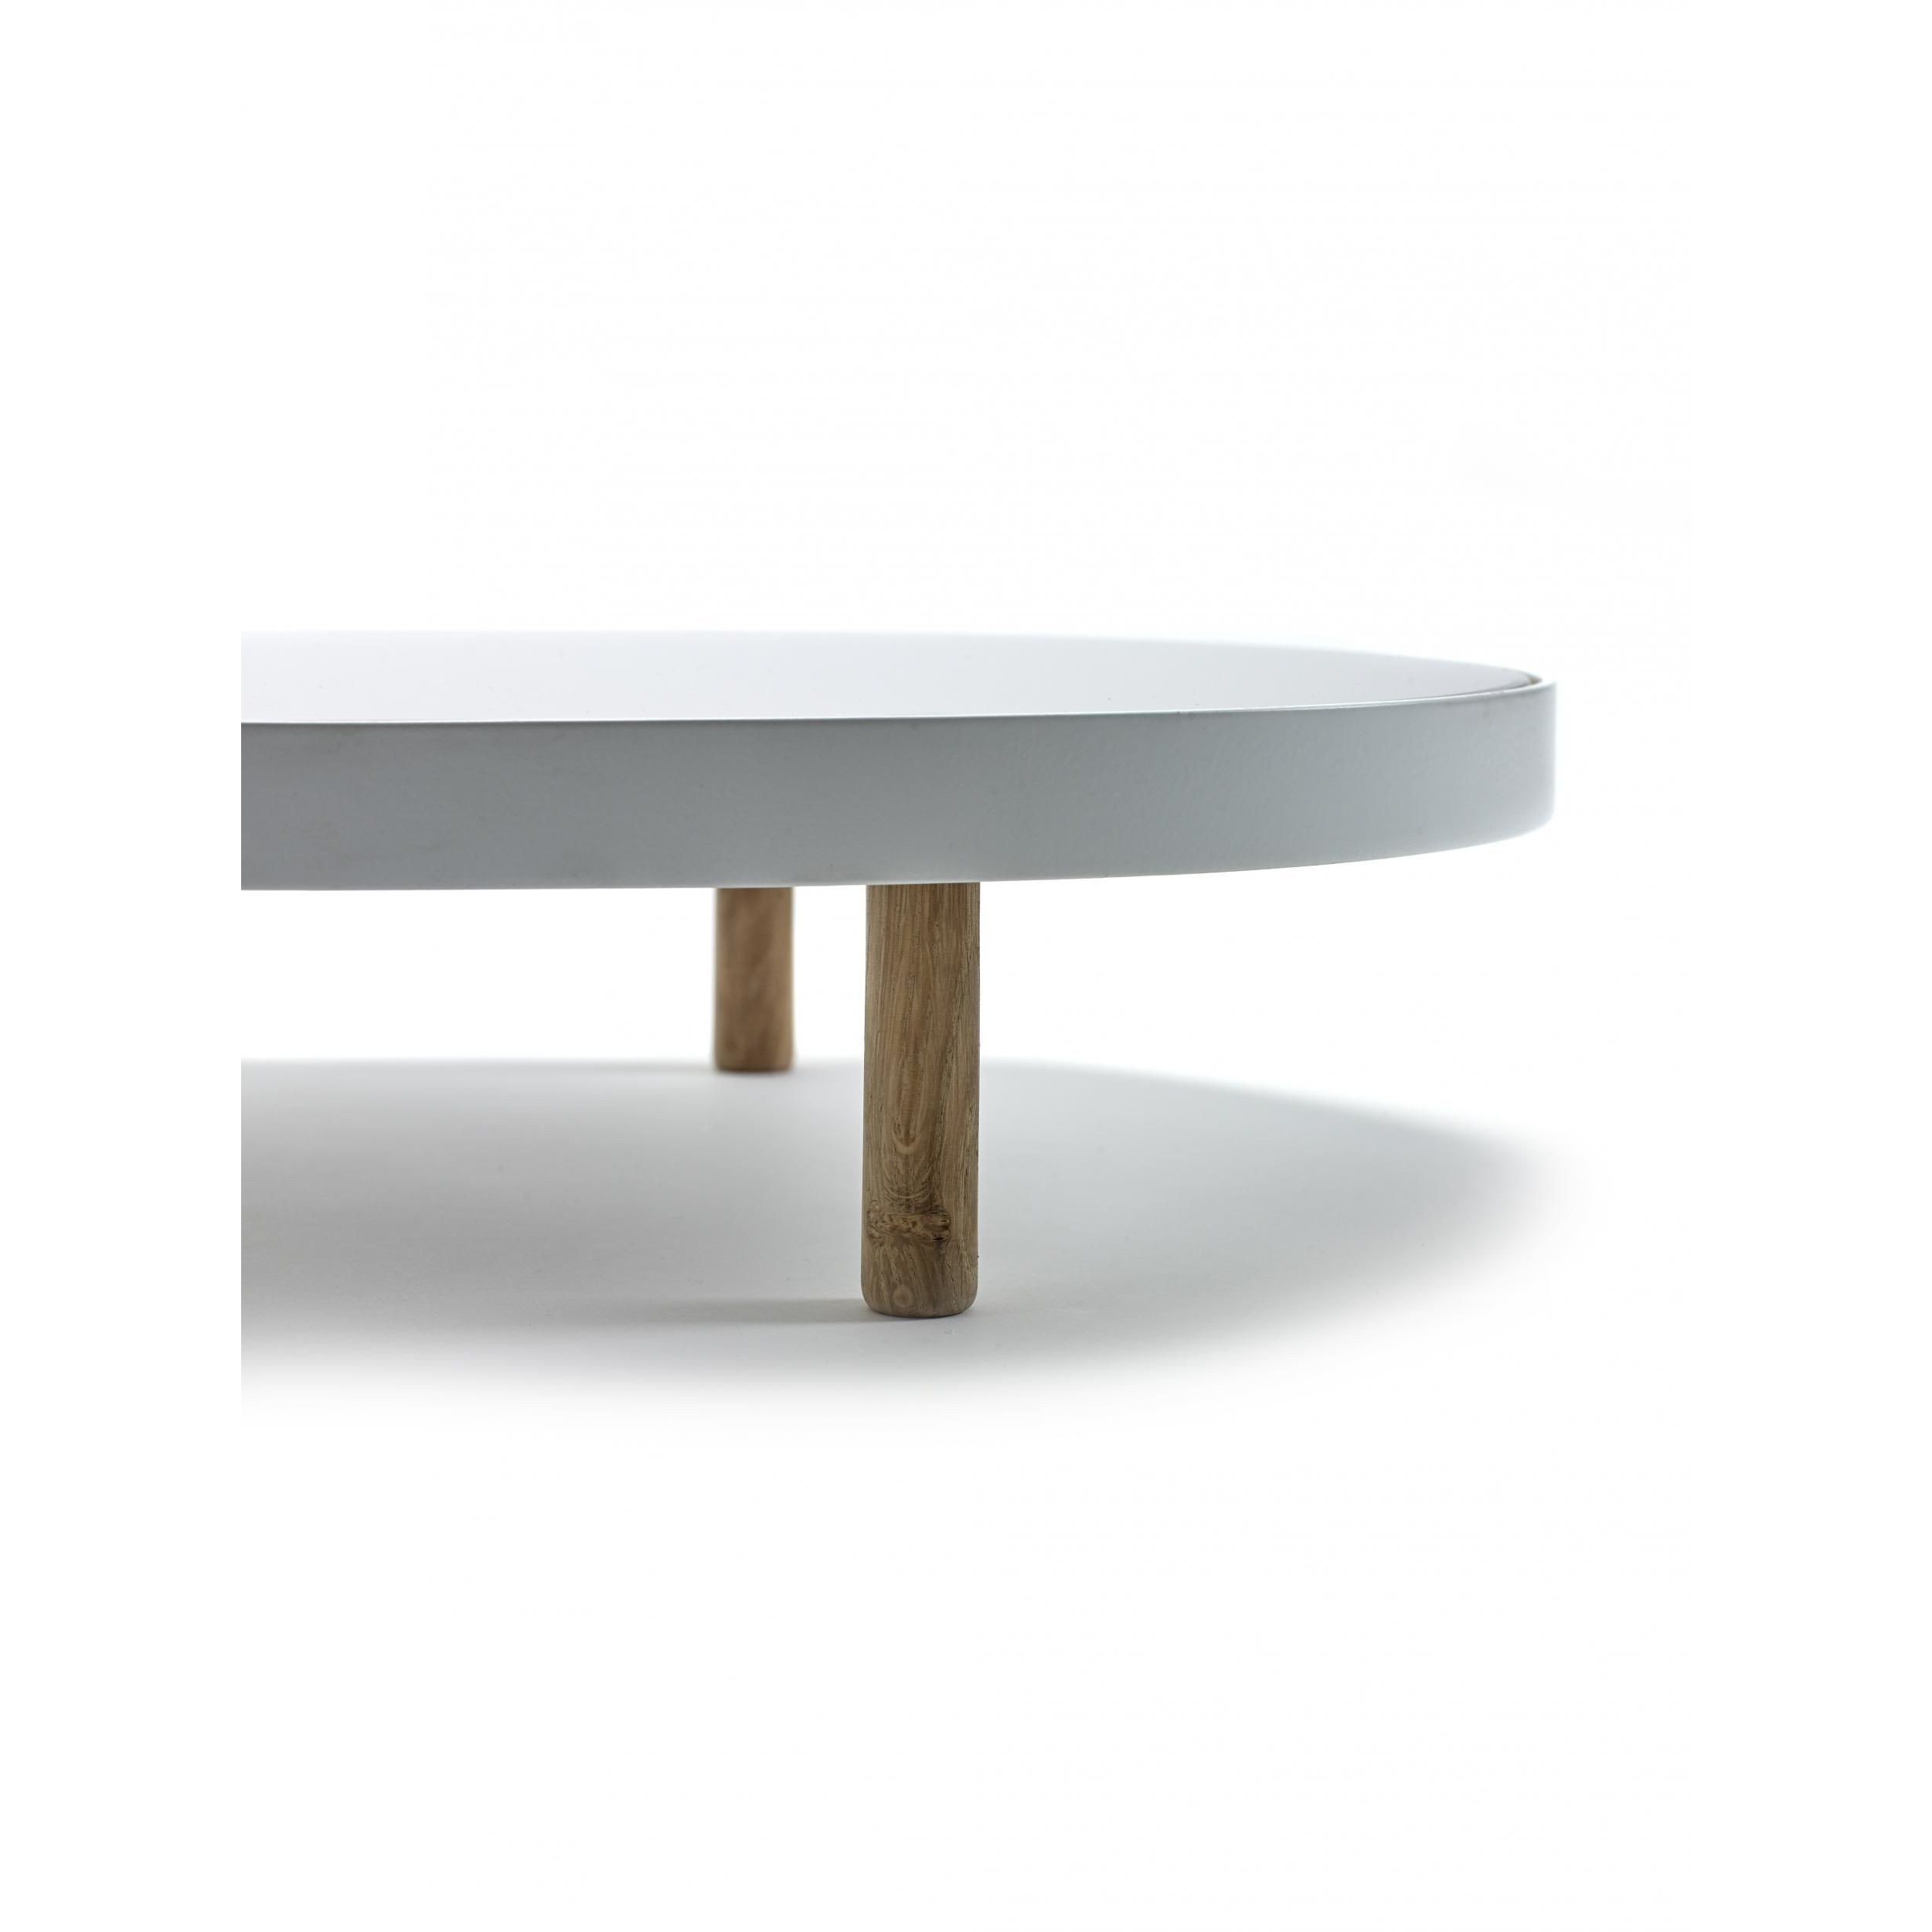 Studio Simple Mirror Tablett Oval 80 cm | Weiß